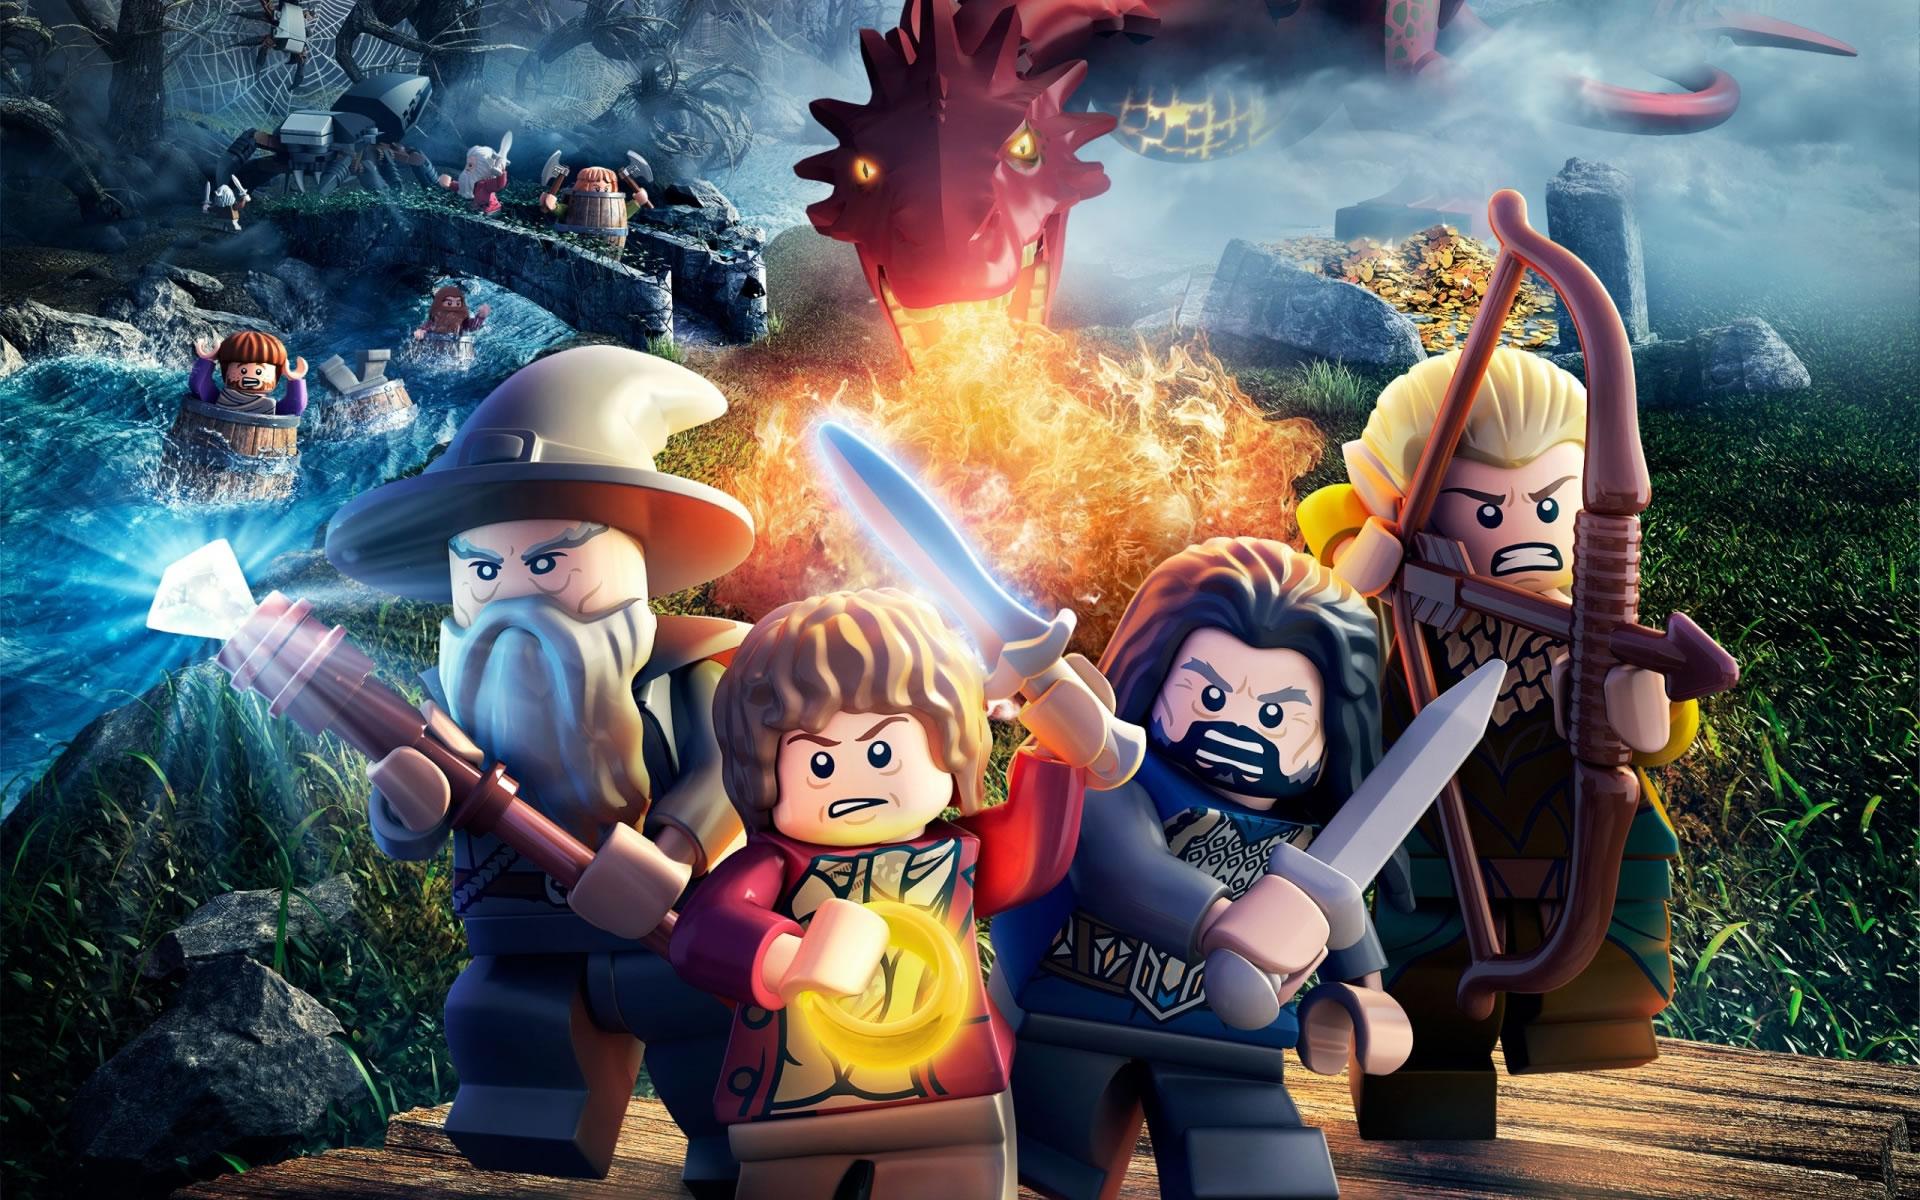 download wallpaper: LEGO – The Hobbit wallpaper